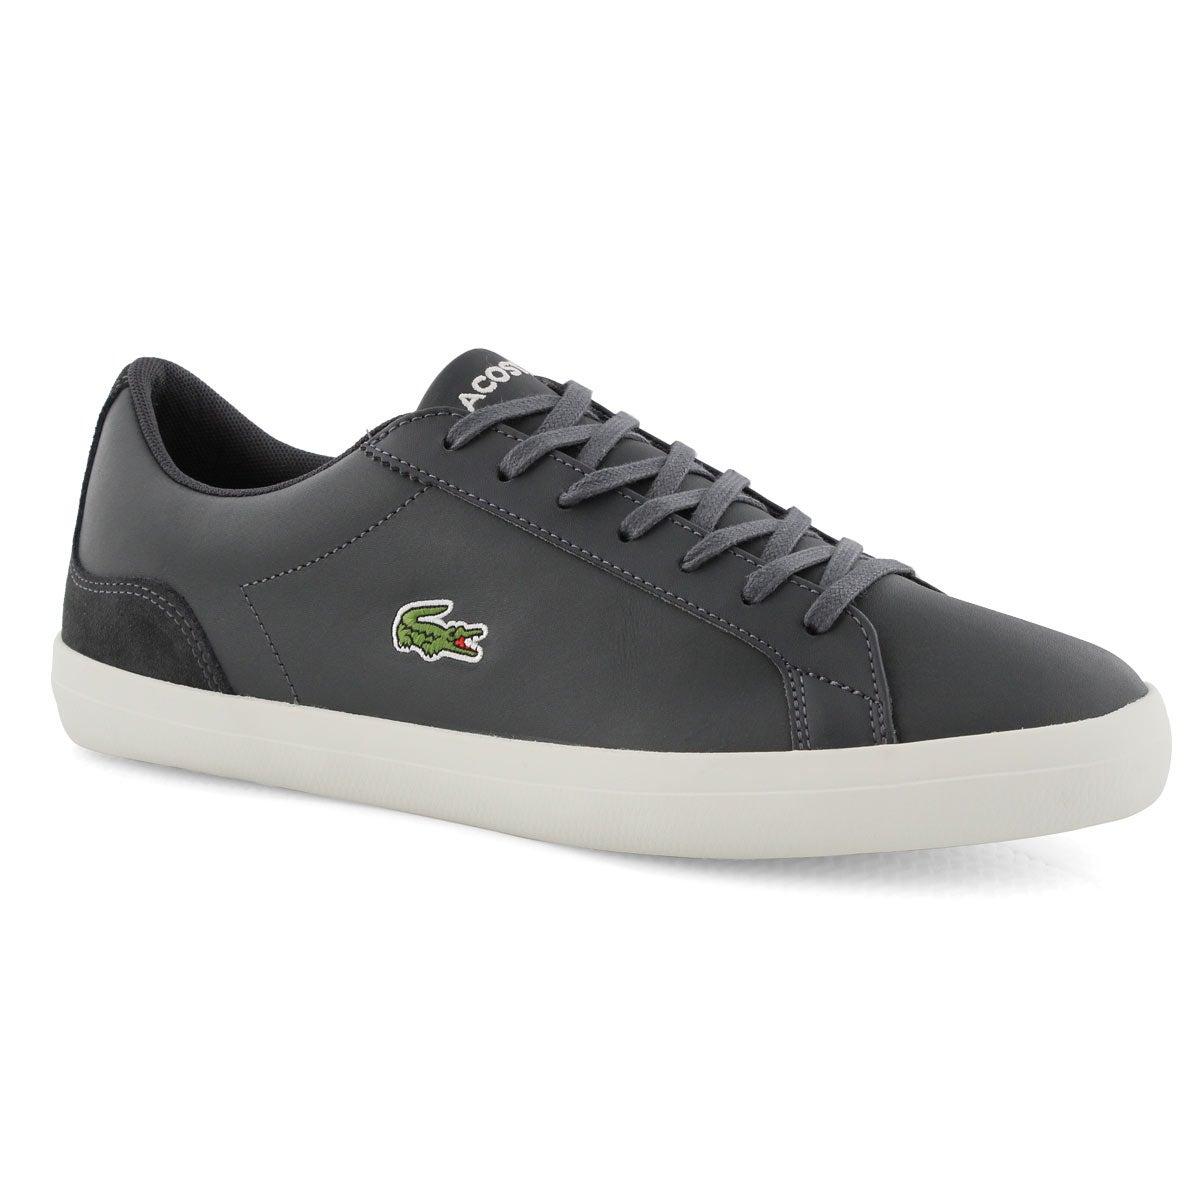 Men's Lerond 319 1 Lace Up Sneaker - Dk Grey/White